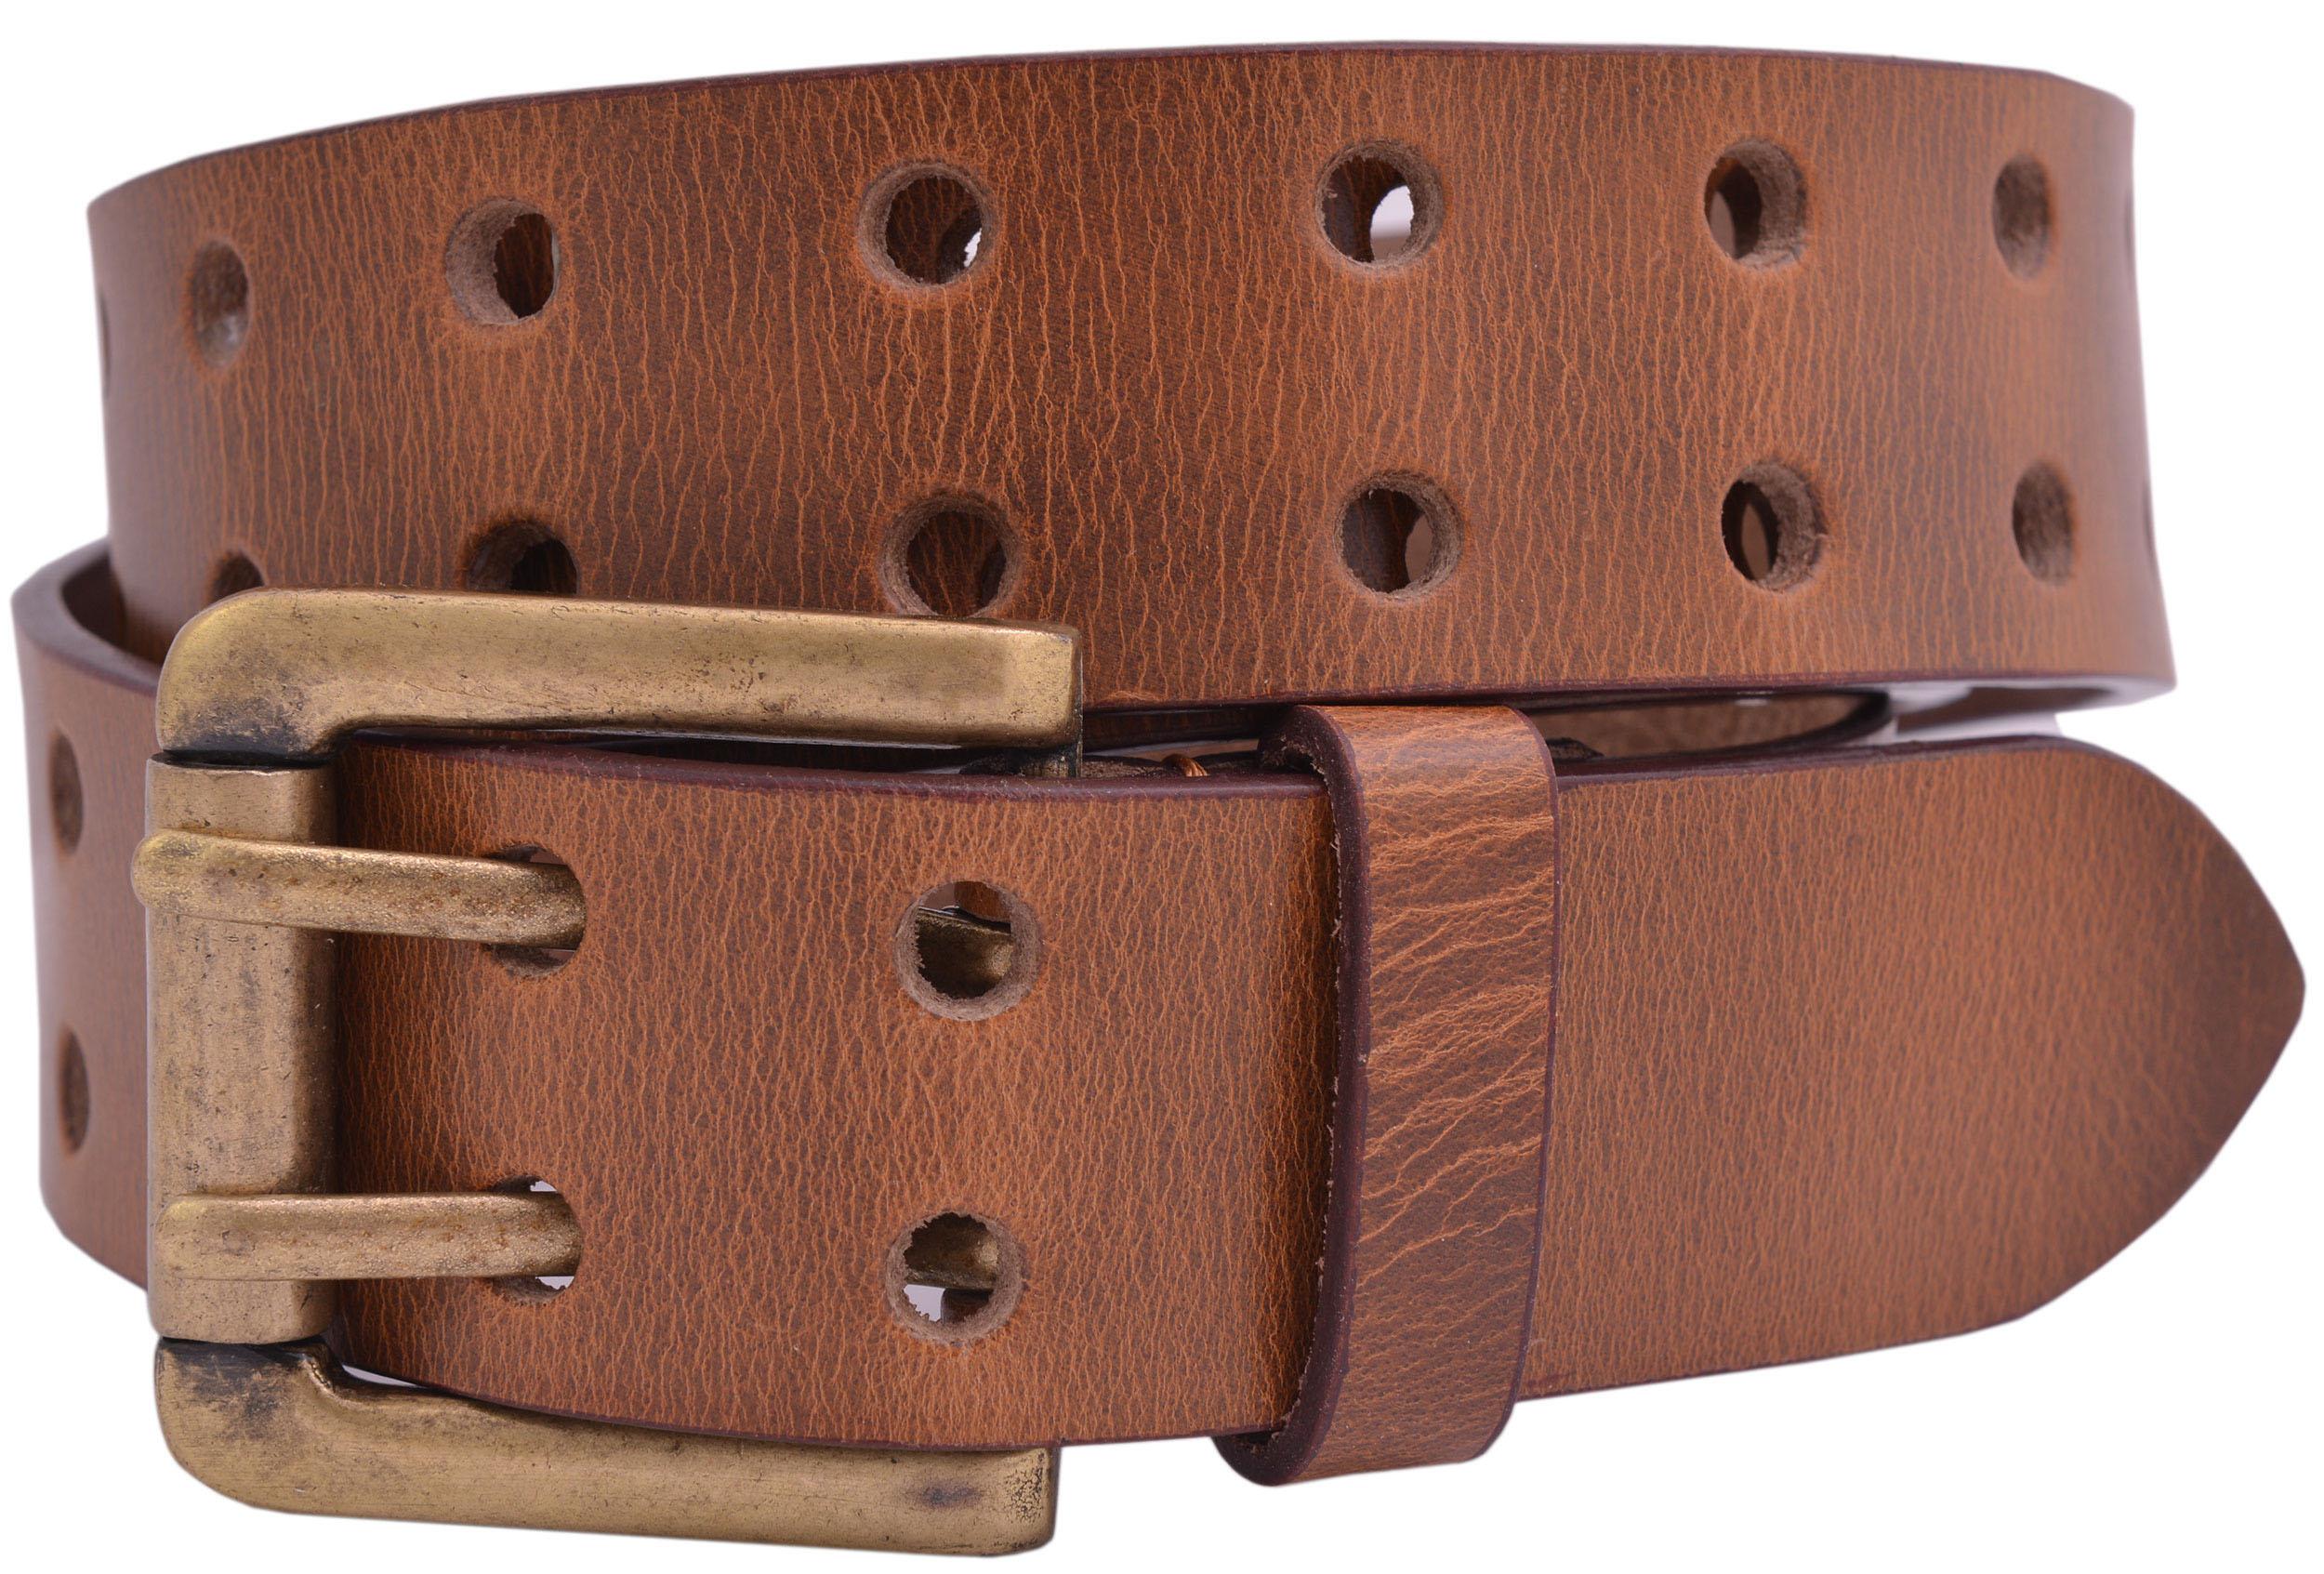 Full Grain Buffalo Leather 3-Hole Jeans Belt Black